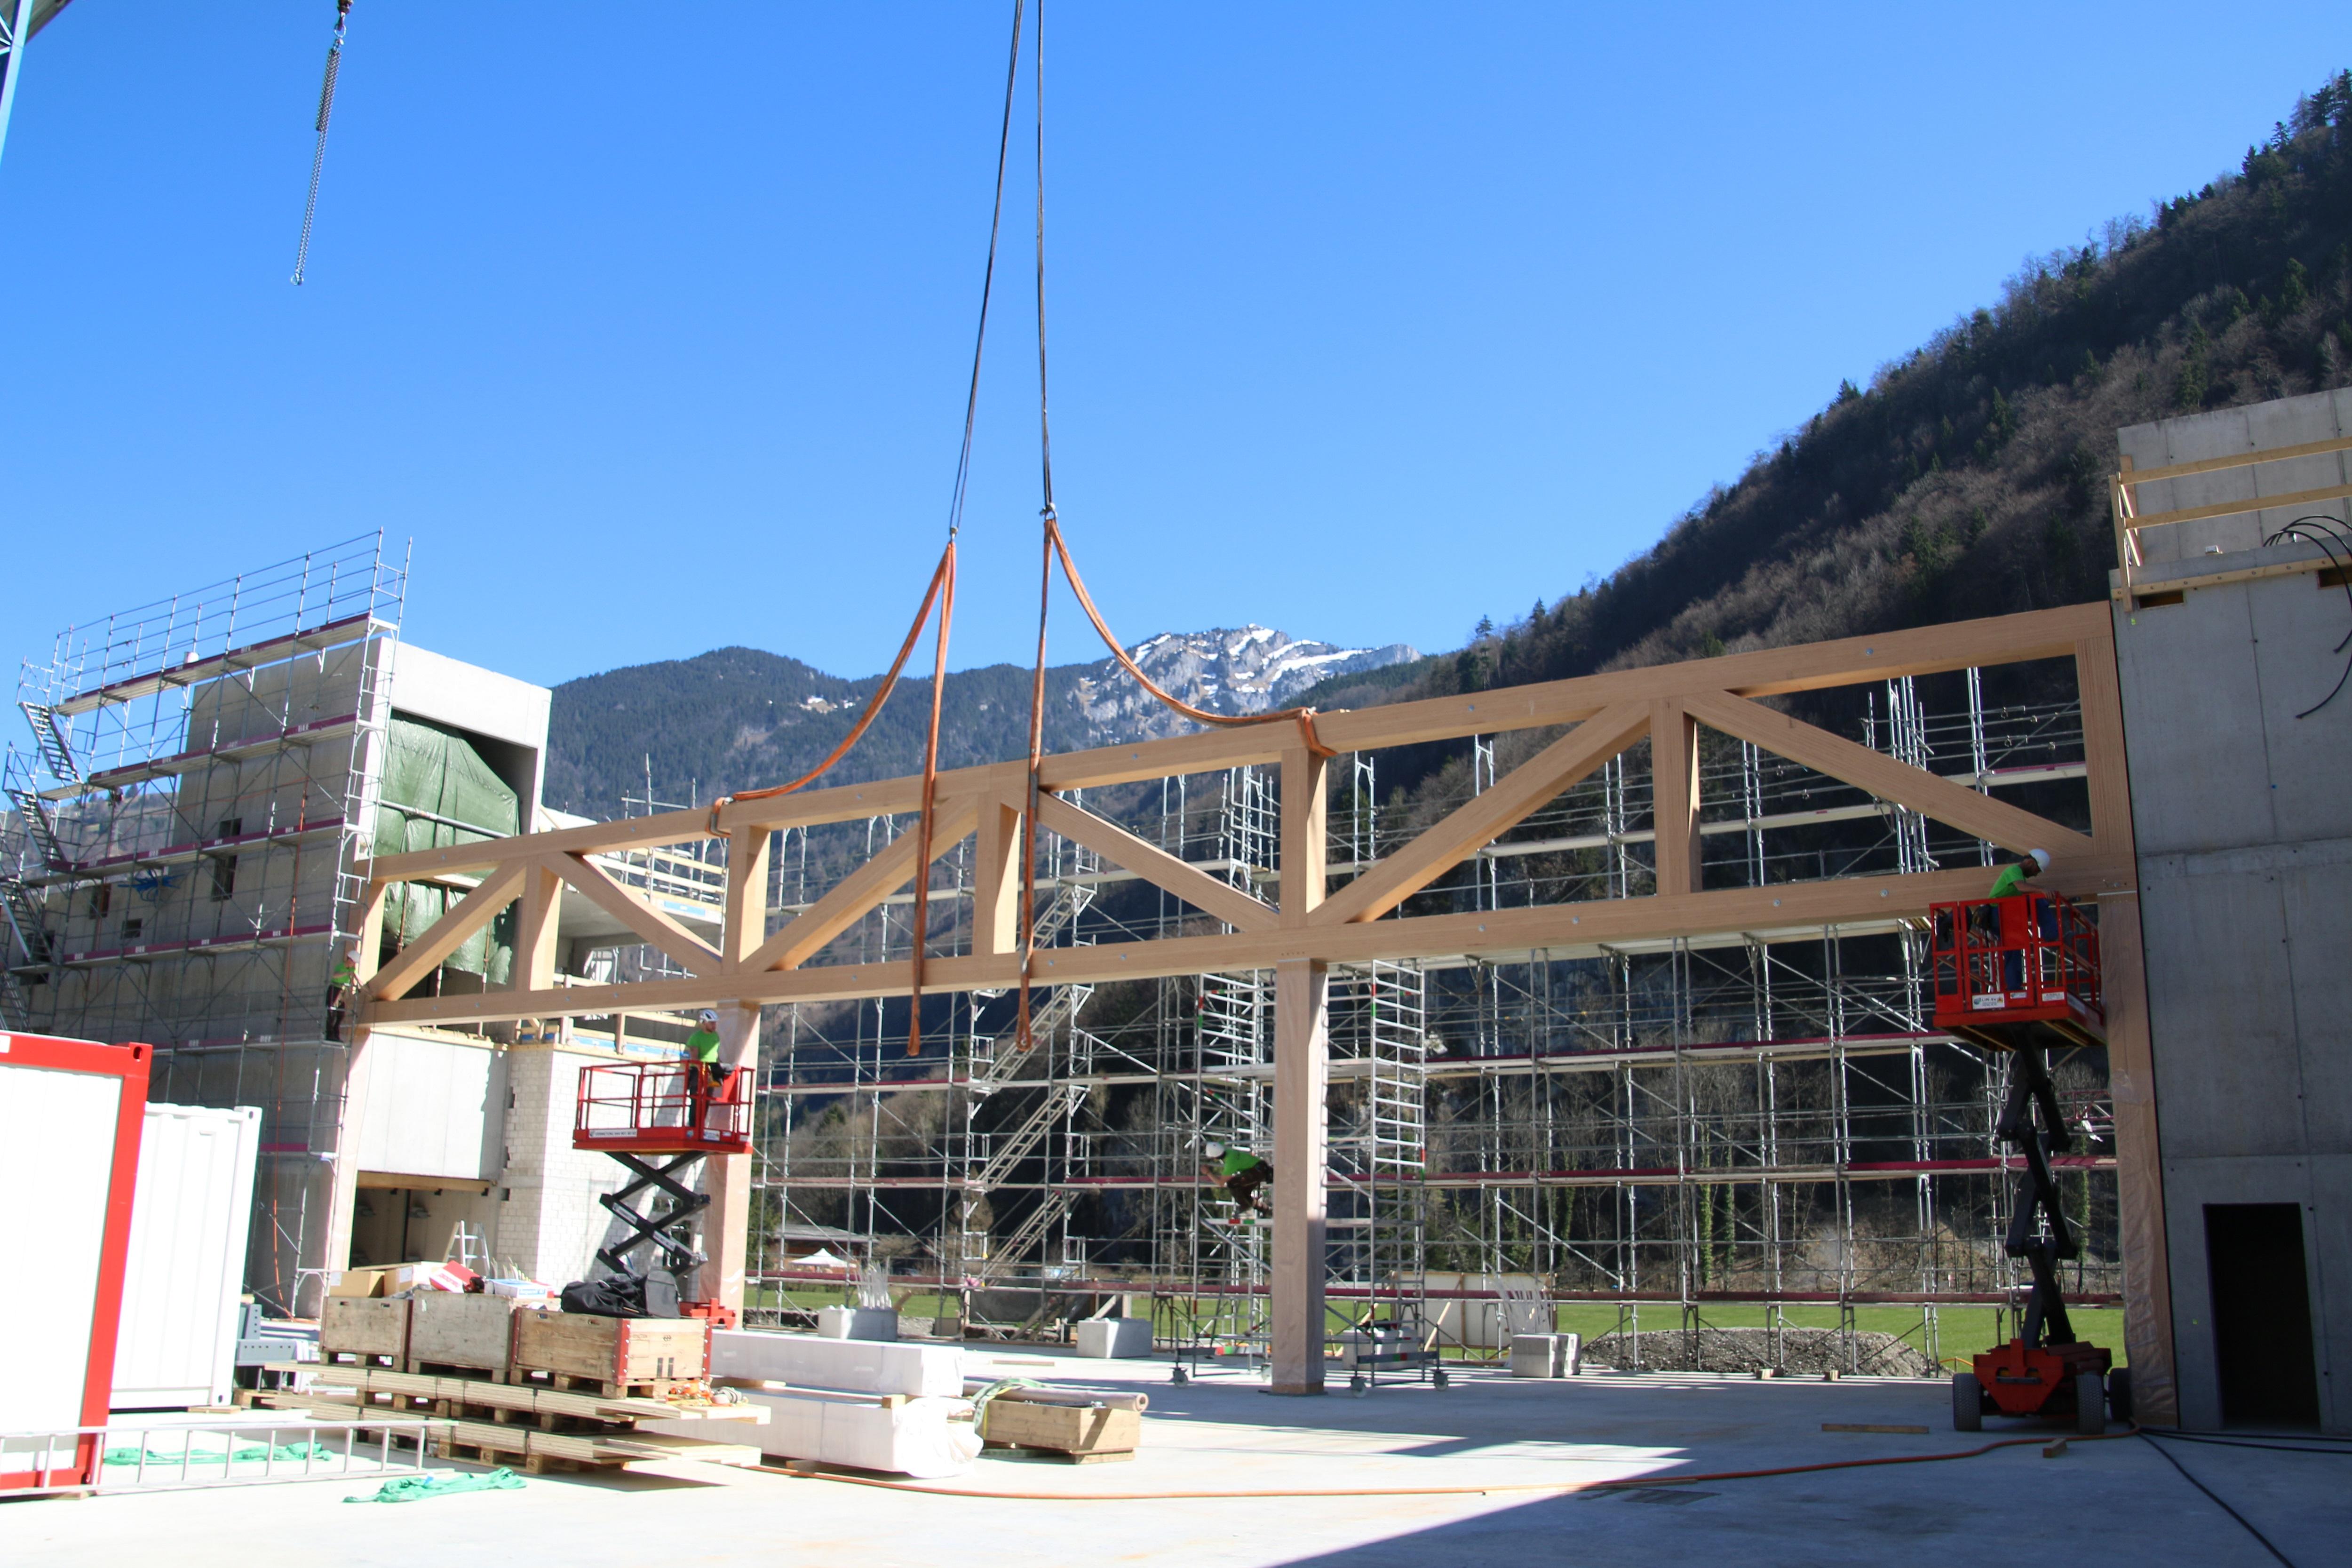 Erster Schweizer Helikopter geht in Holzhalle in Serie